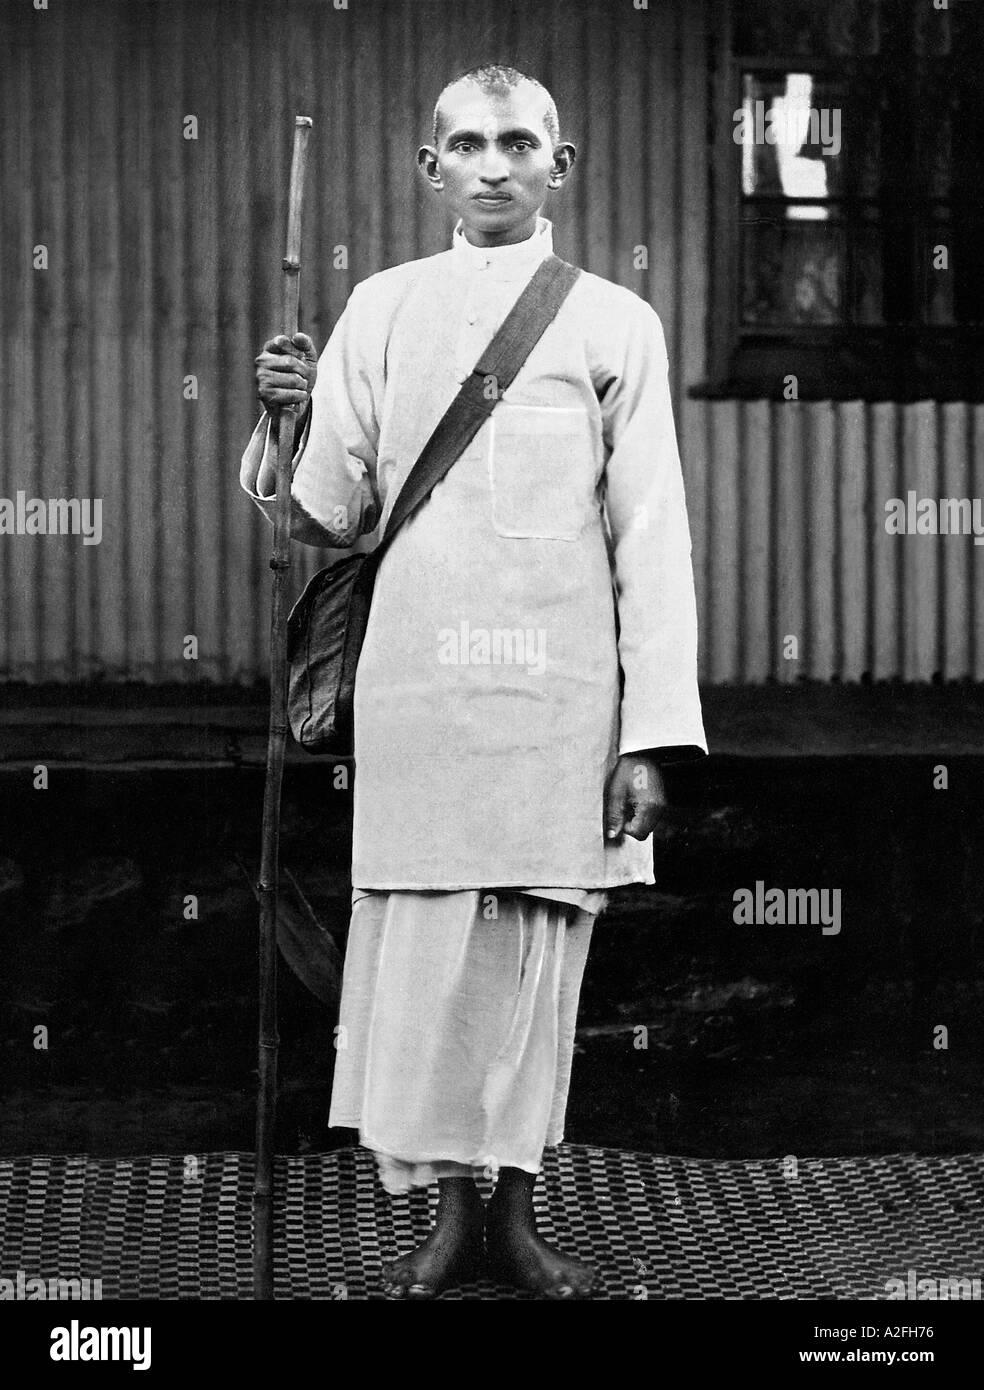 Il Mahatma Gandhi durante la campagna satyagraha 1913 India Immagini Stock